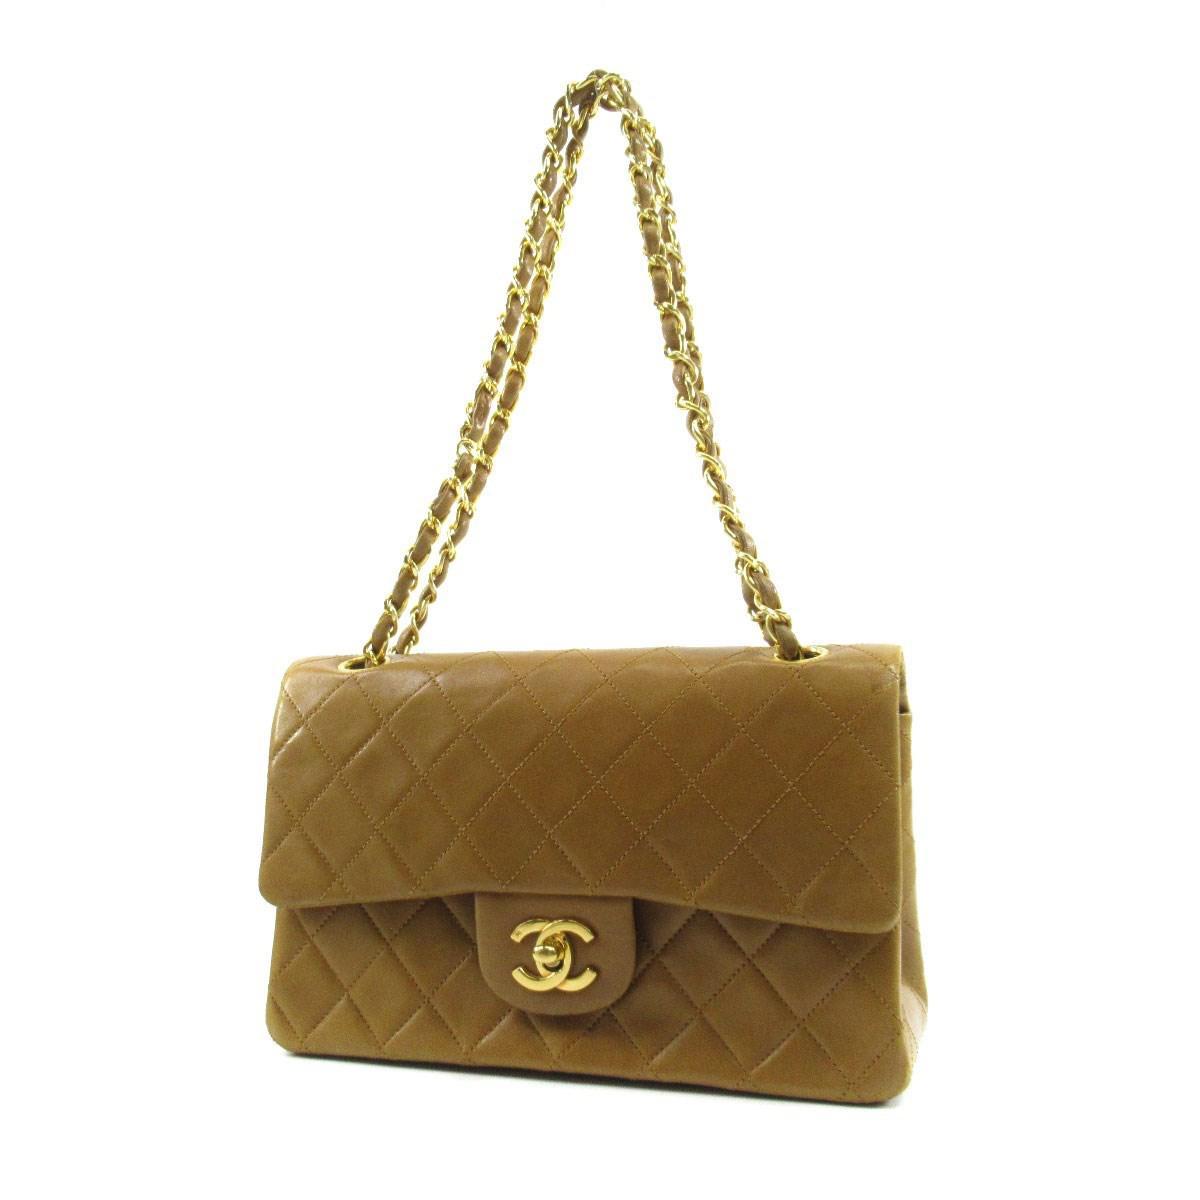 7eec68ae9c1 Lyst - Chanel Lambskin Shoulder Bag Coco Mark Chain in Brown